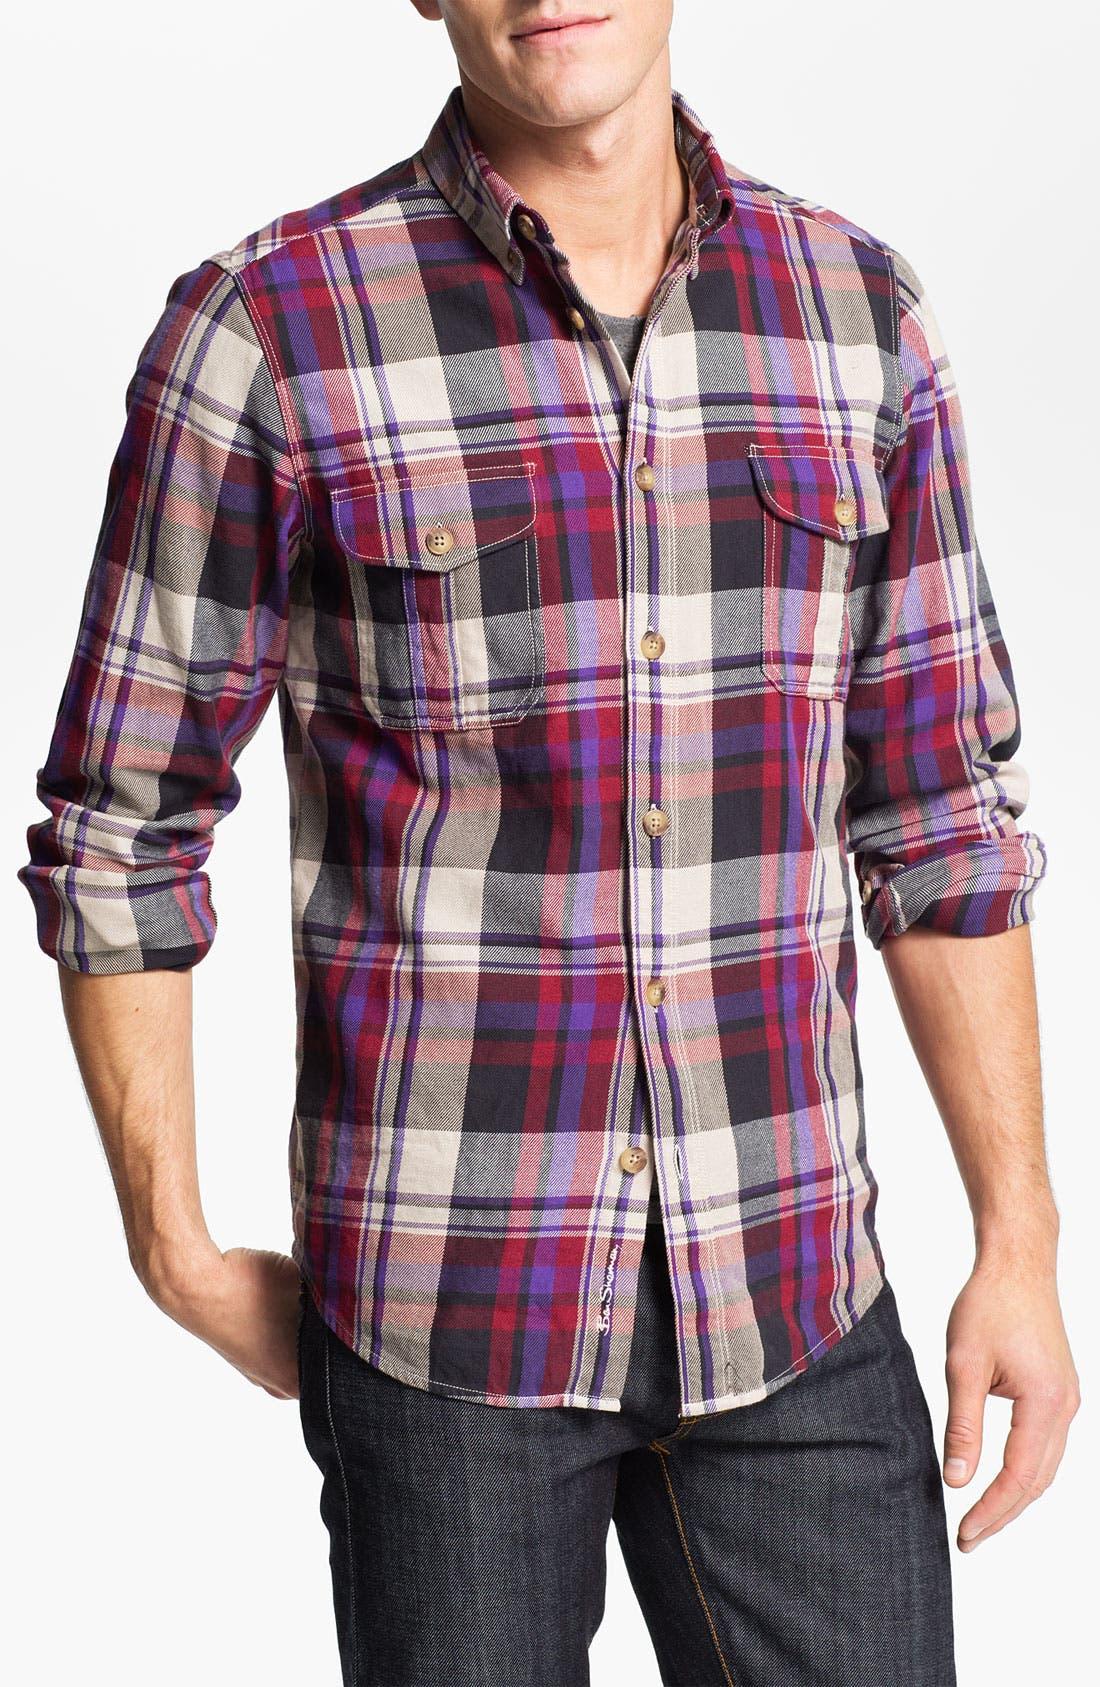 Main Image - Ben Sherman 'Clerkenwell' Plaid Flannel Shirt